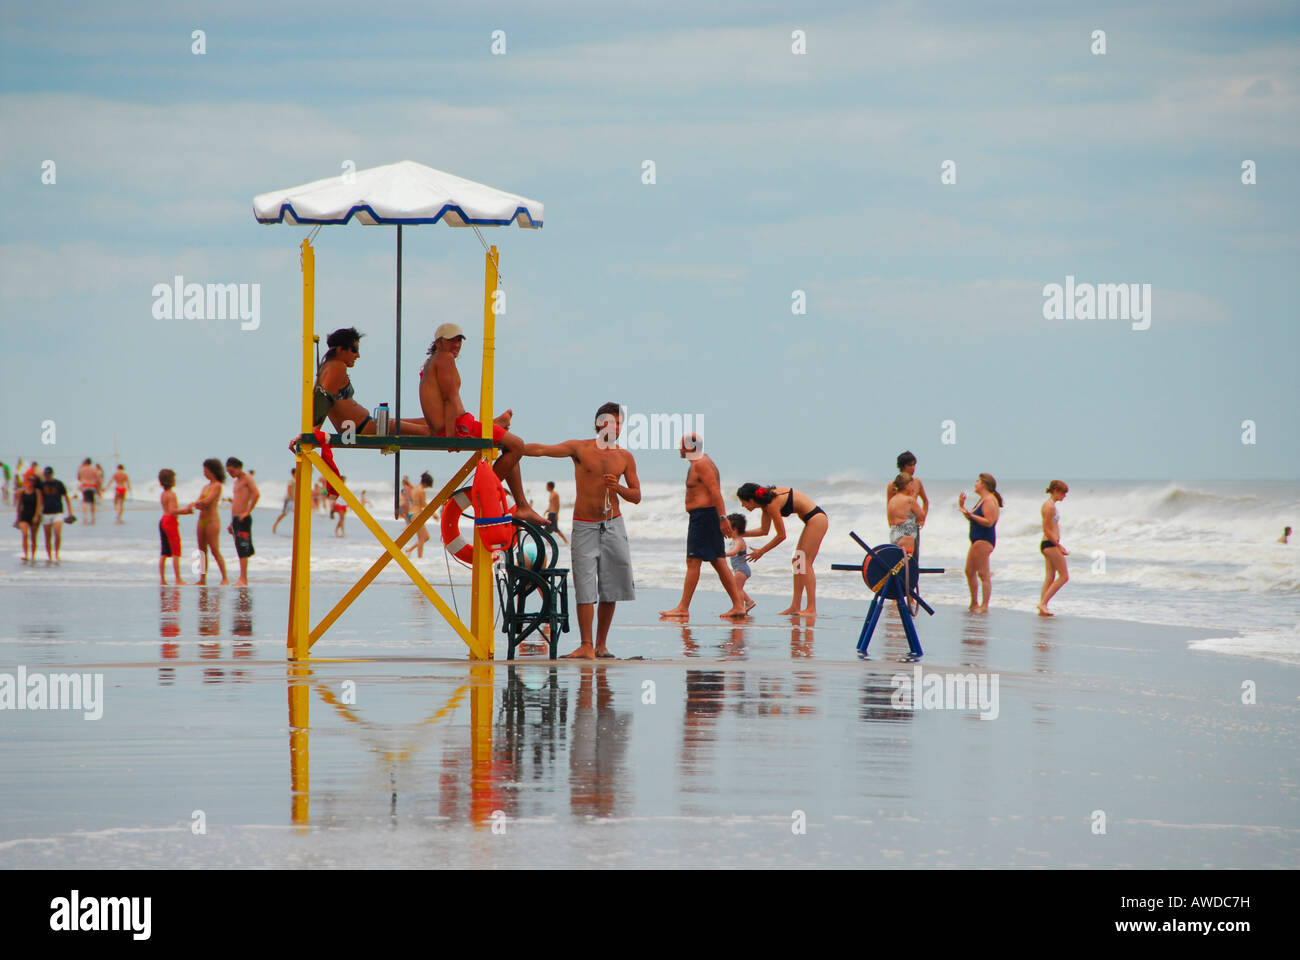 Beach at Pinamar, Buenos Aires province, Argentina - Stock Image